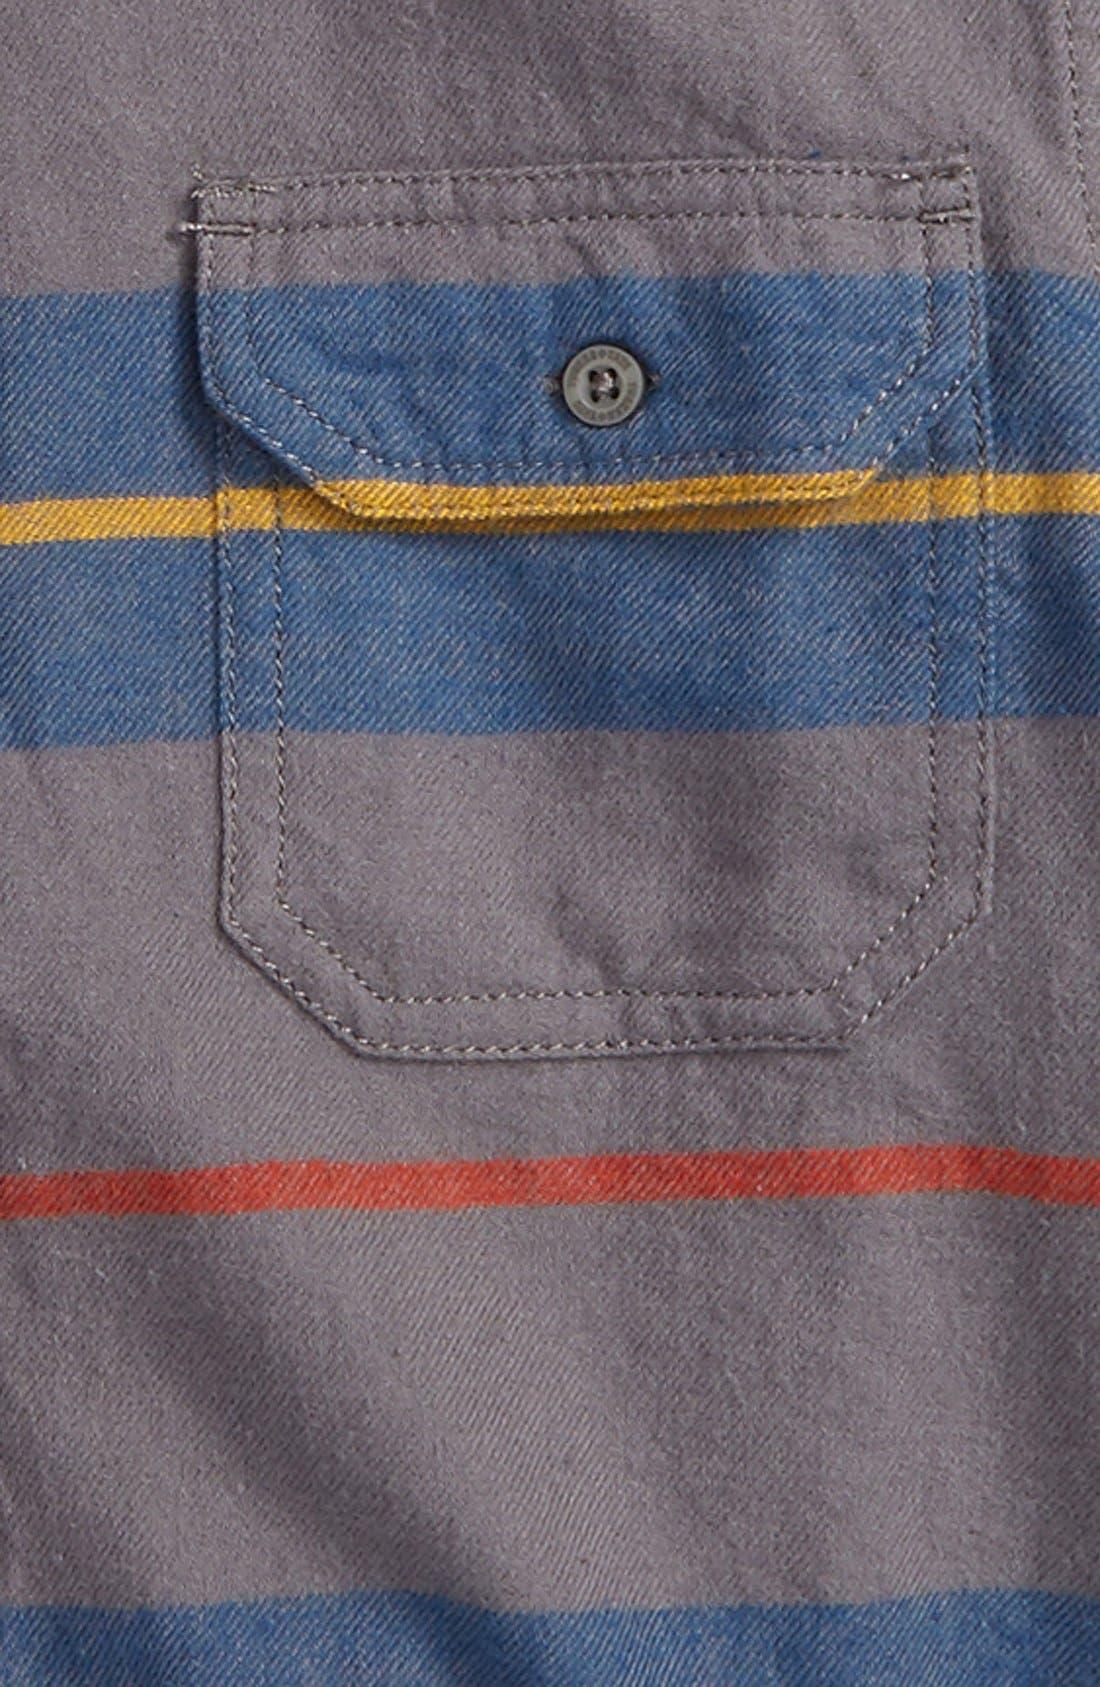 Long Sleeve Plaid Flannel Shirt,                             Alternate thumbnail 2, color,                             021